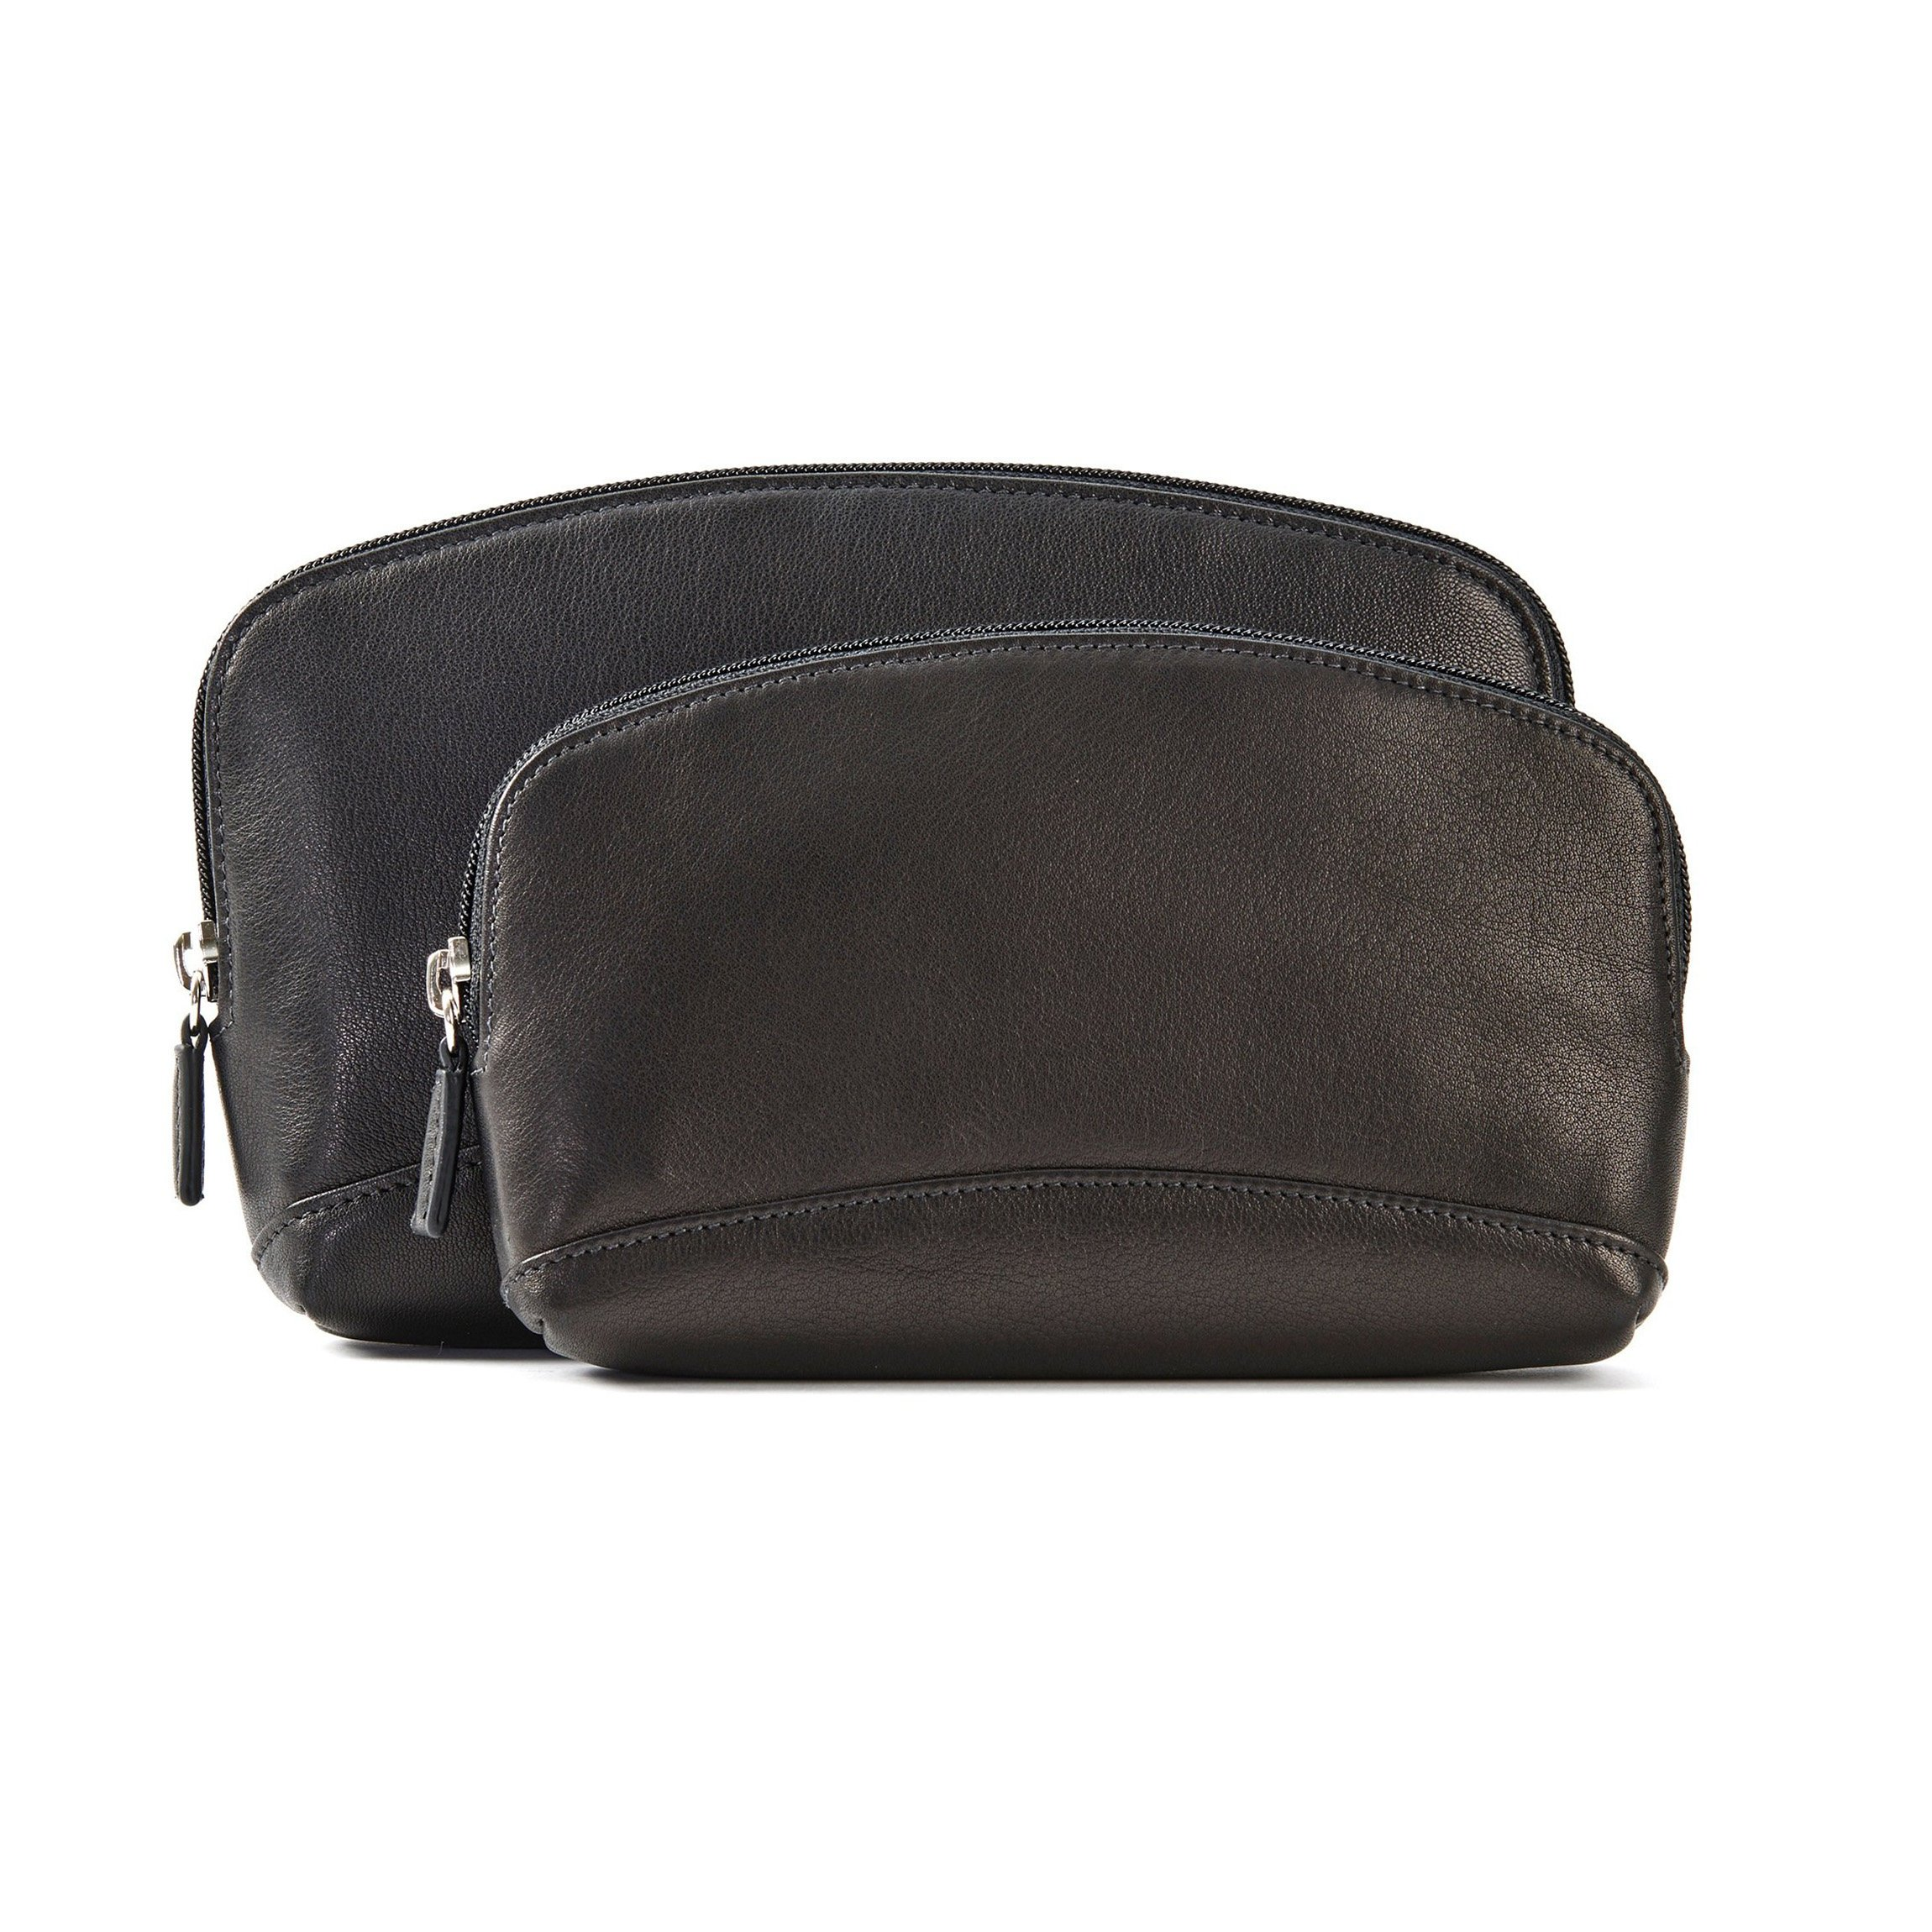 Cosmetic Bag Set - Full Grain Leather - Black Onyx (black) by Leatherology